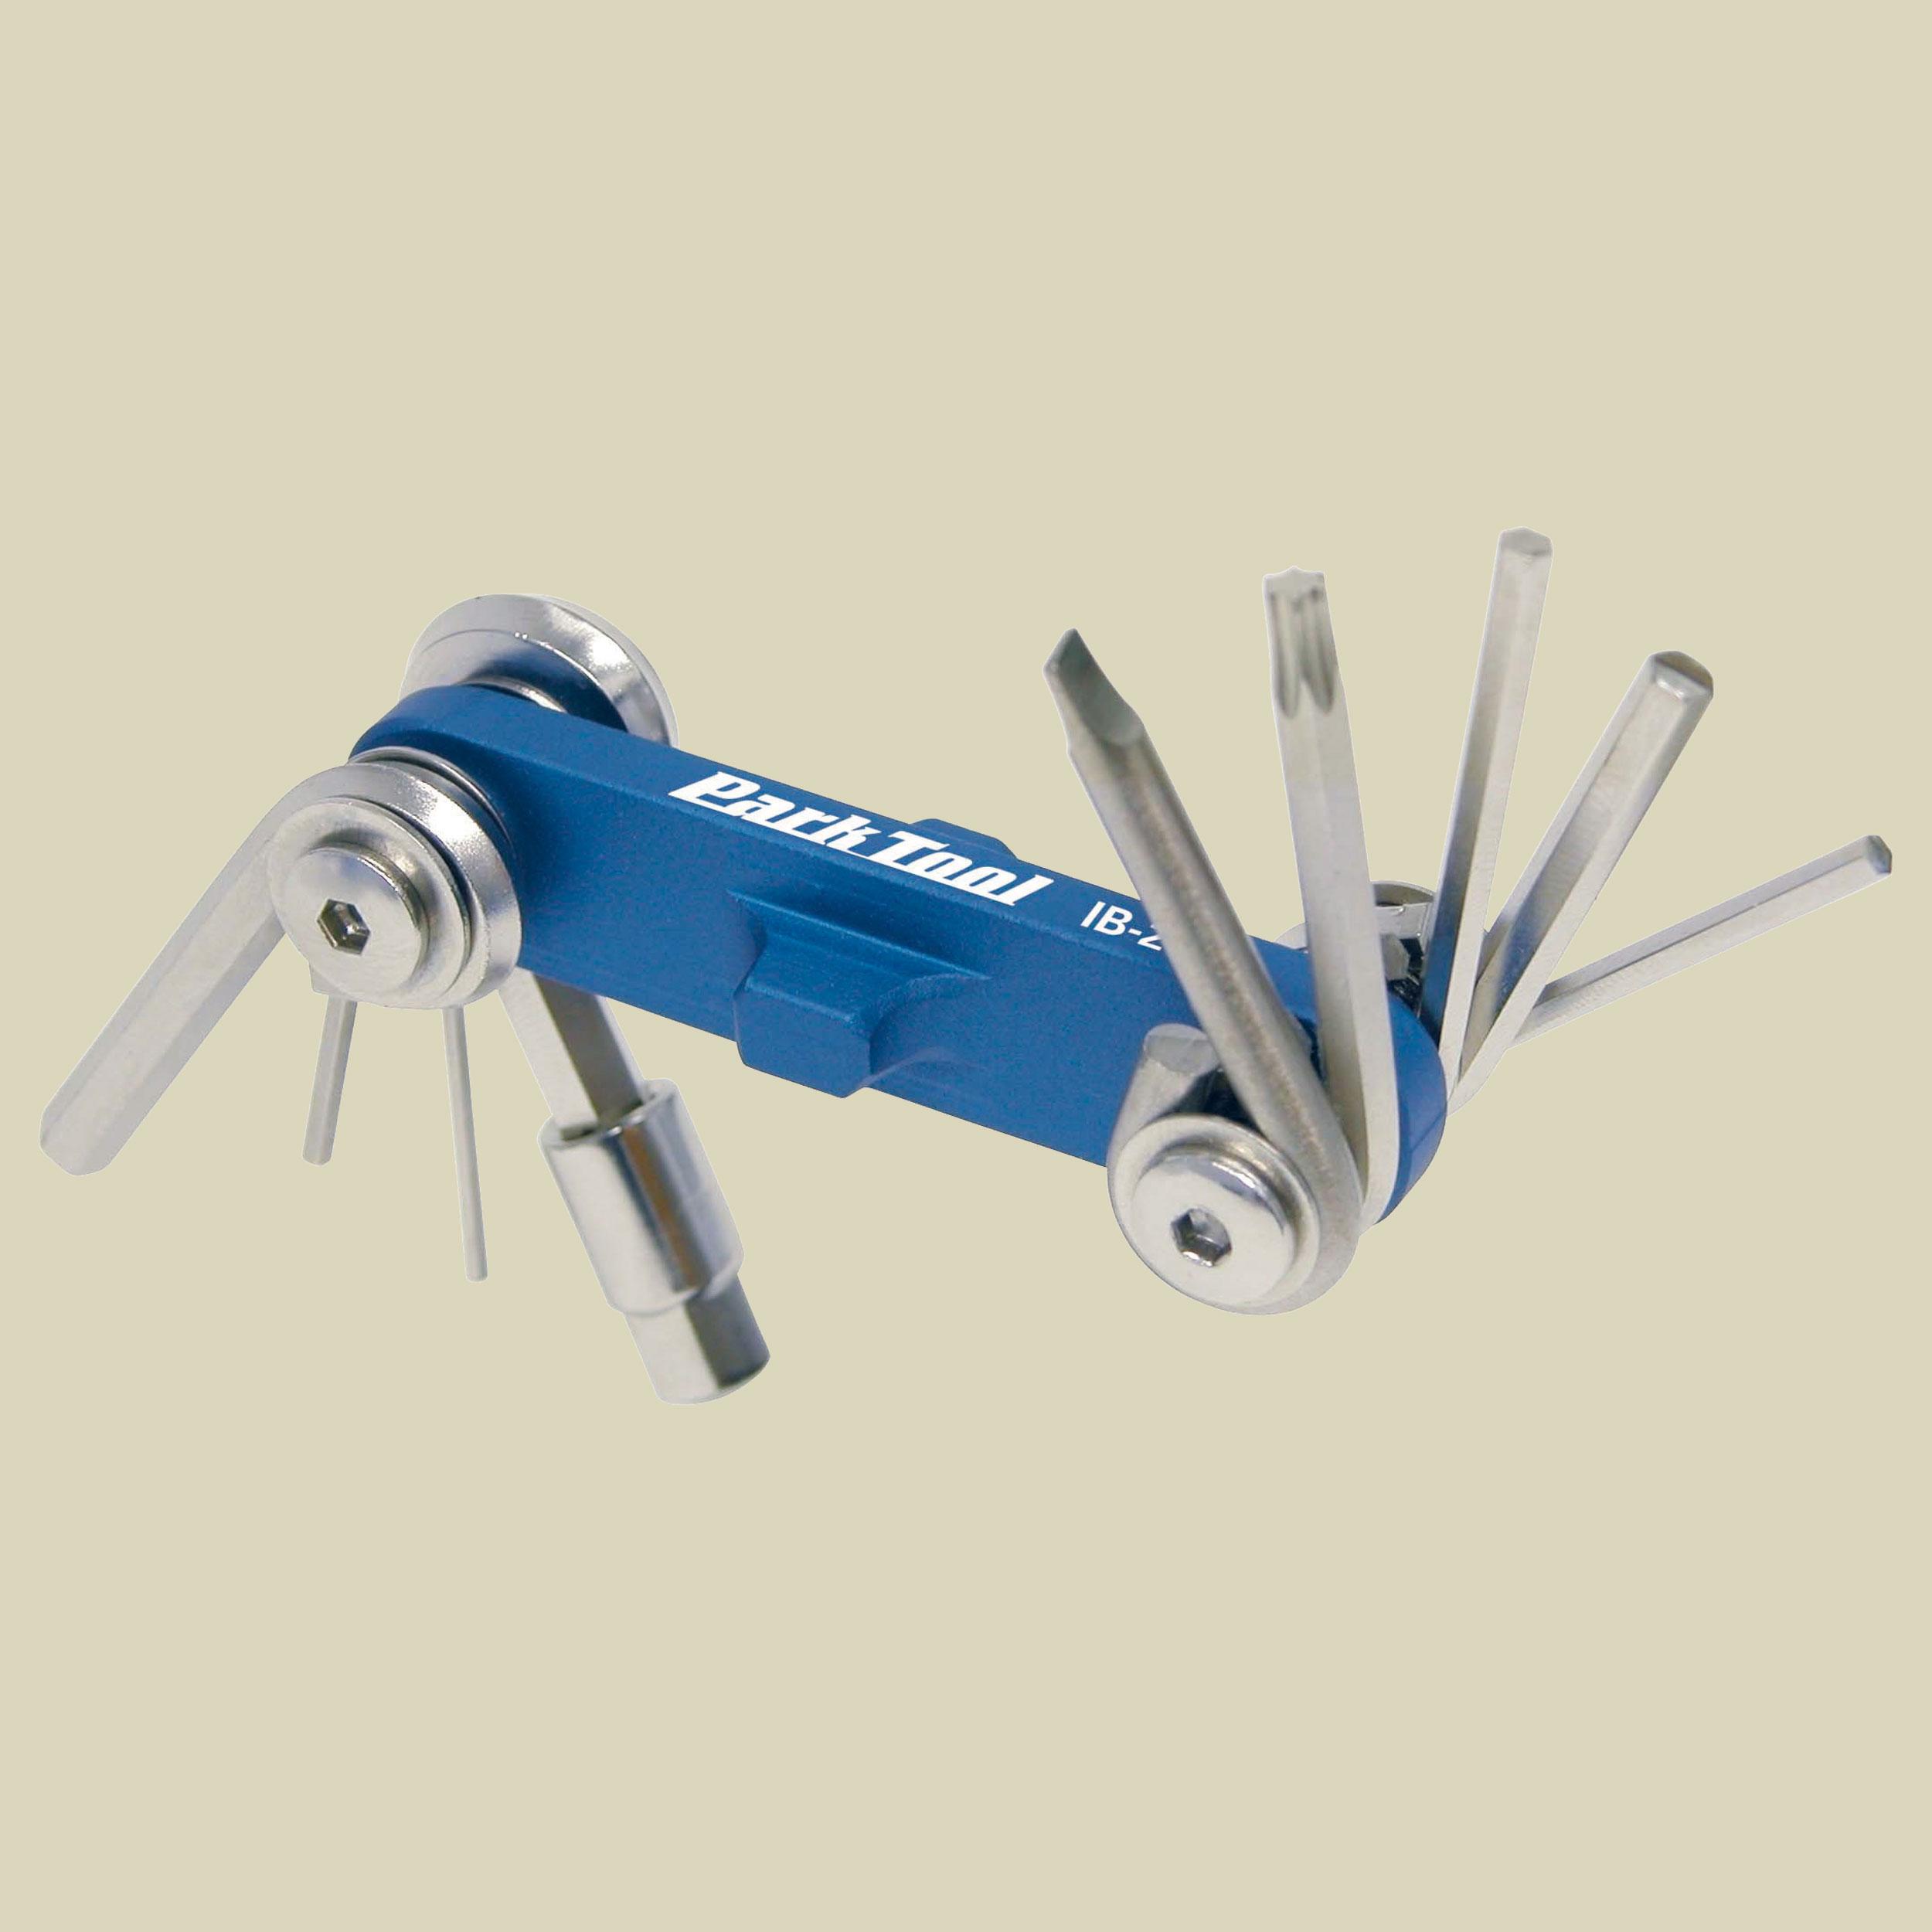 Park Tool IB-2 I-Beam Mini-Faltwerkzeug Mini-Faltwerkzeug